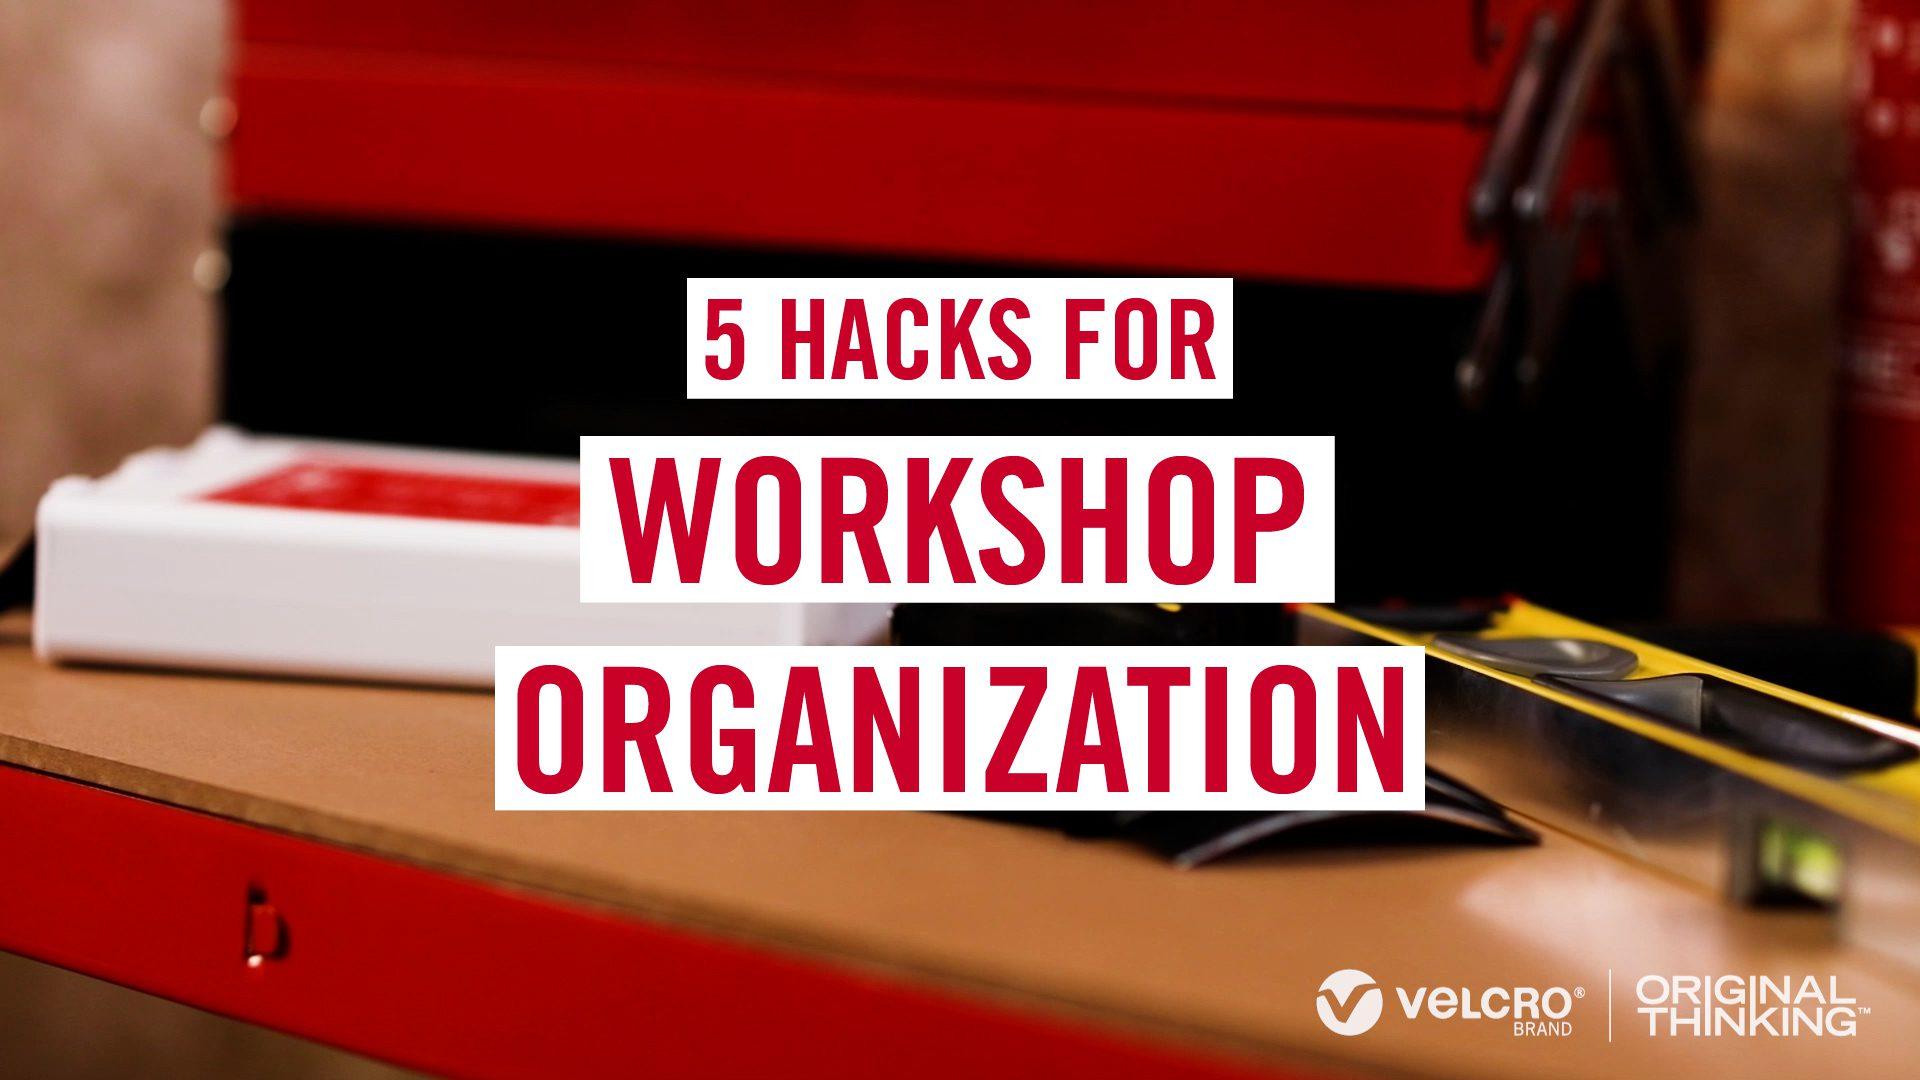 Workshop Organization - 5 hacks